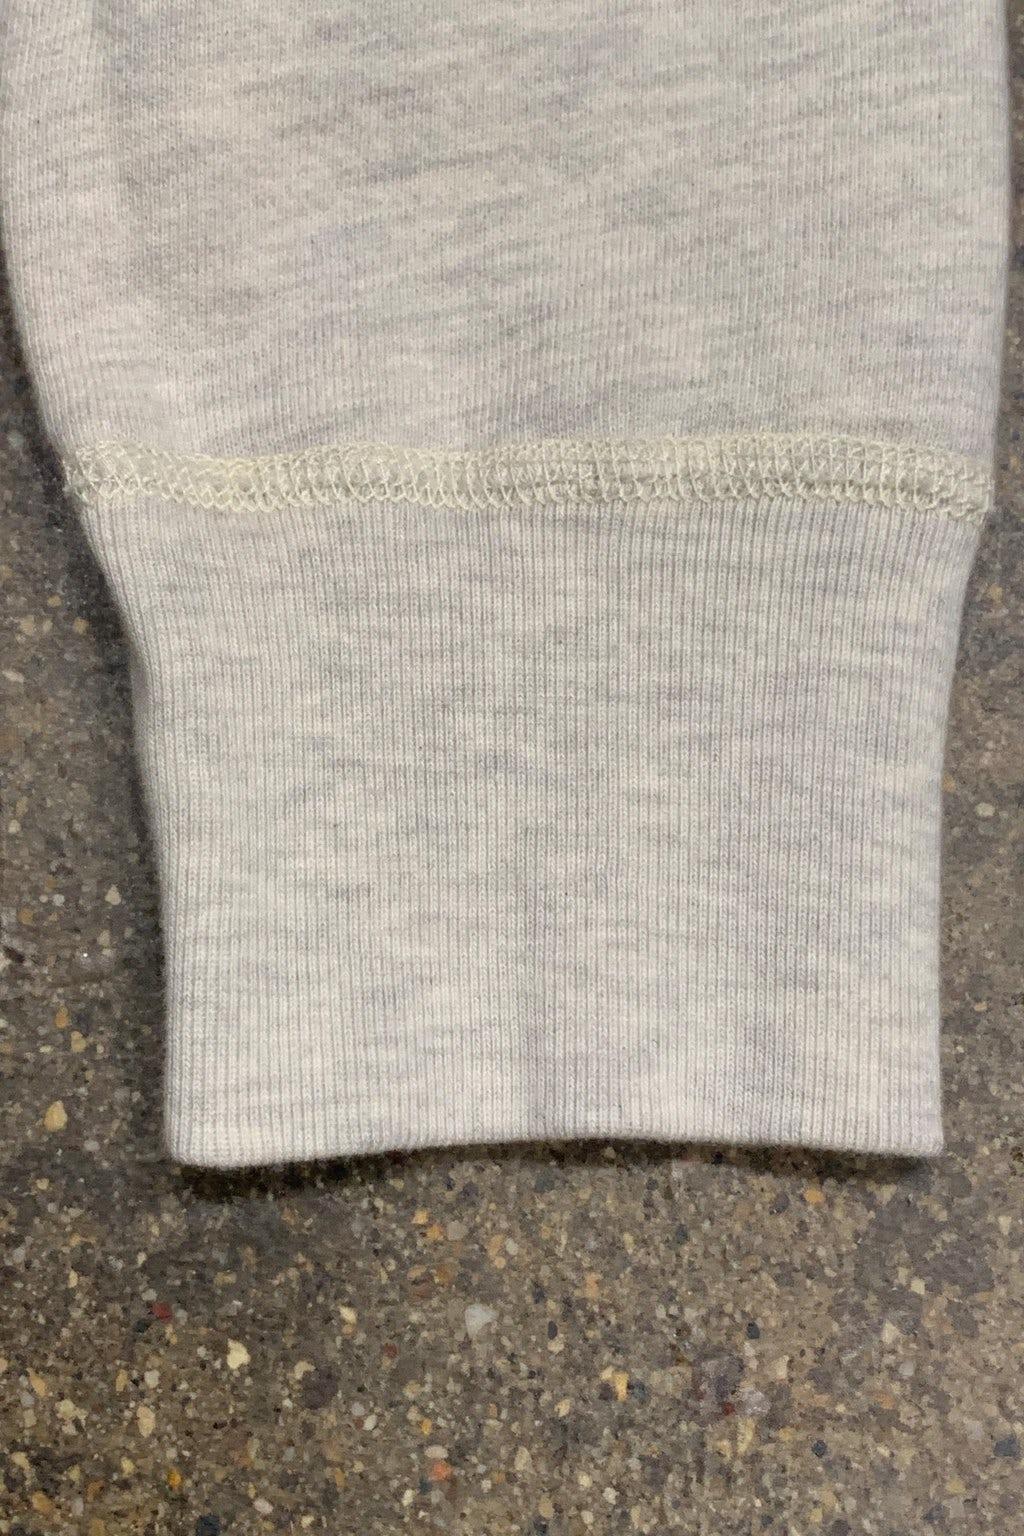 Velva Sheen 10 OZ. Raglan Sweatshirt Oatmeal